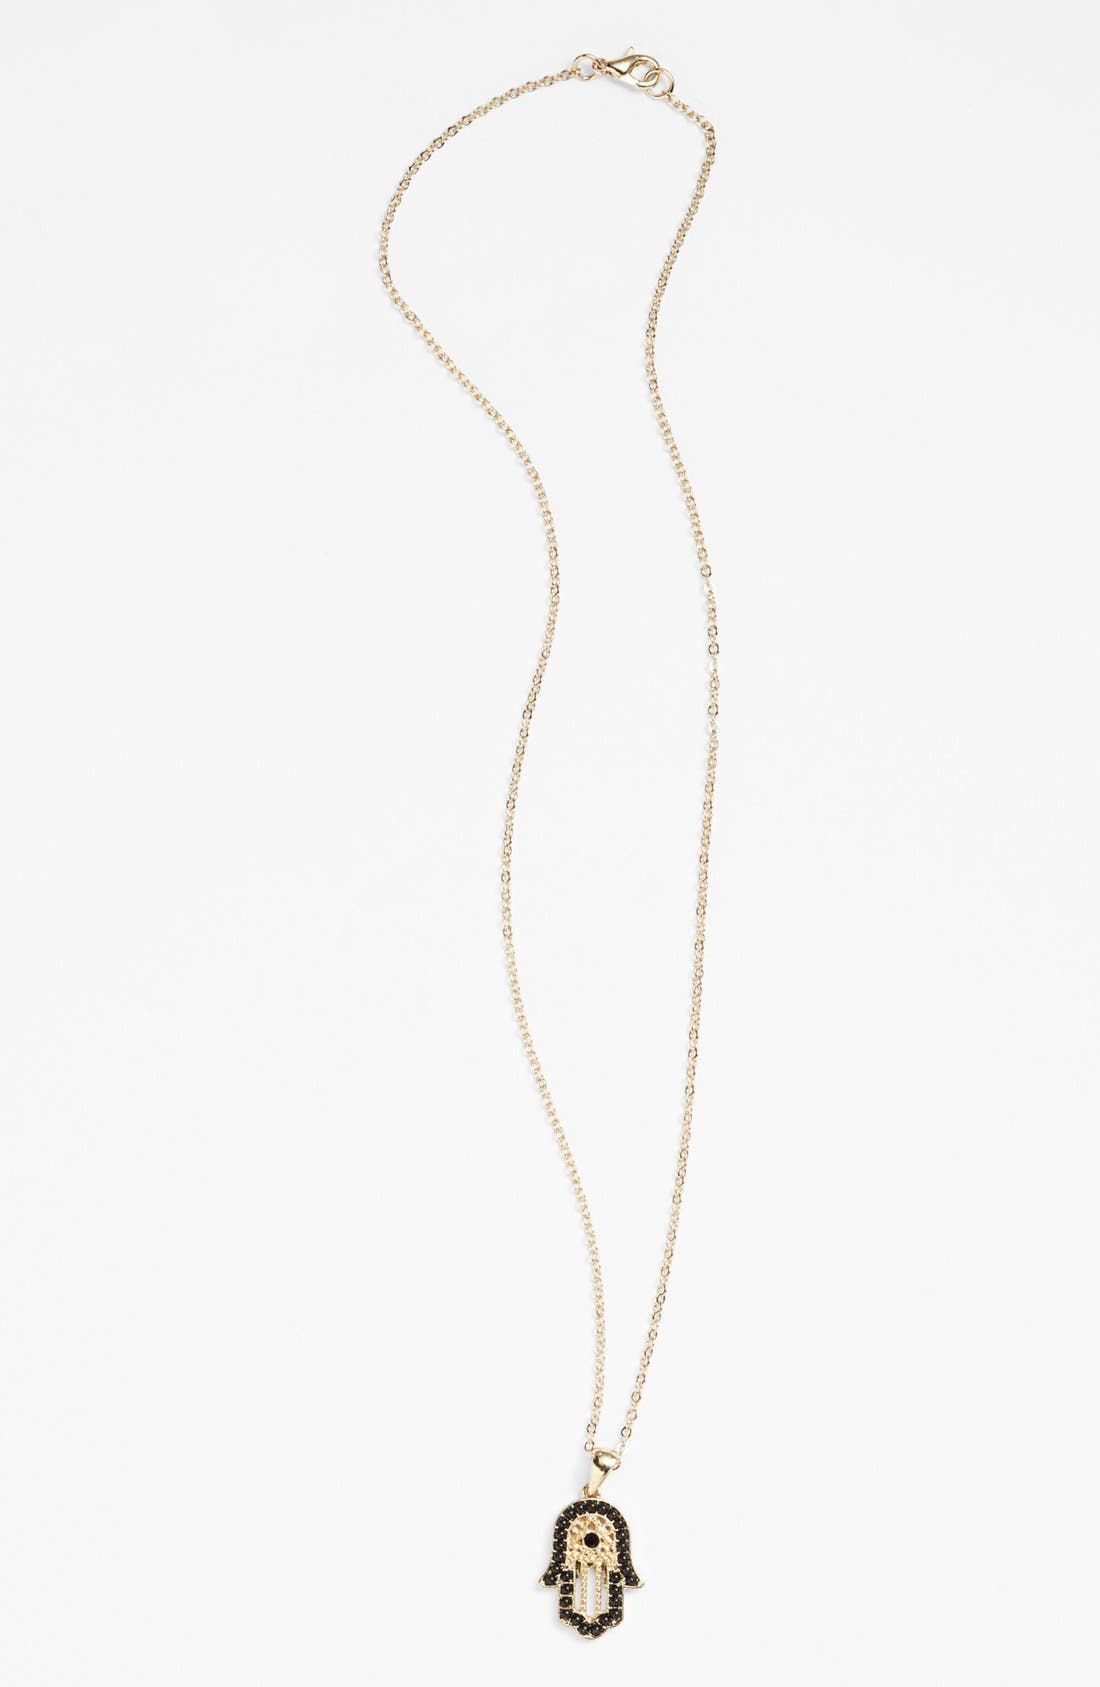 Main Image - Nico New York Hamsa Pendant Necklace